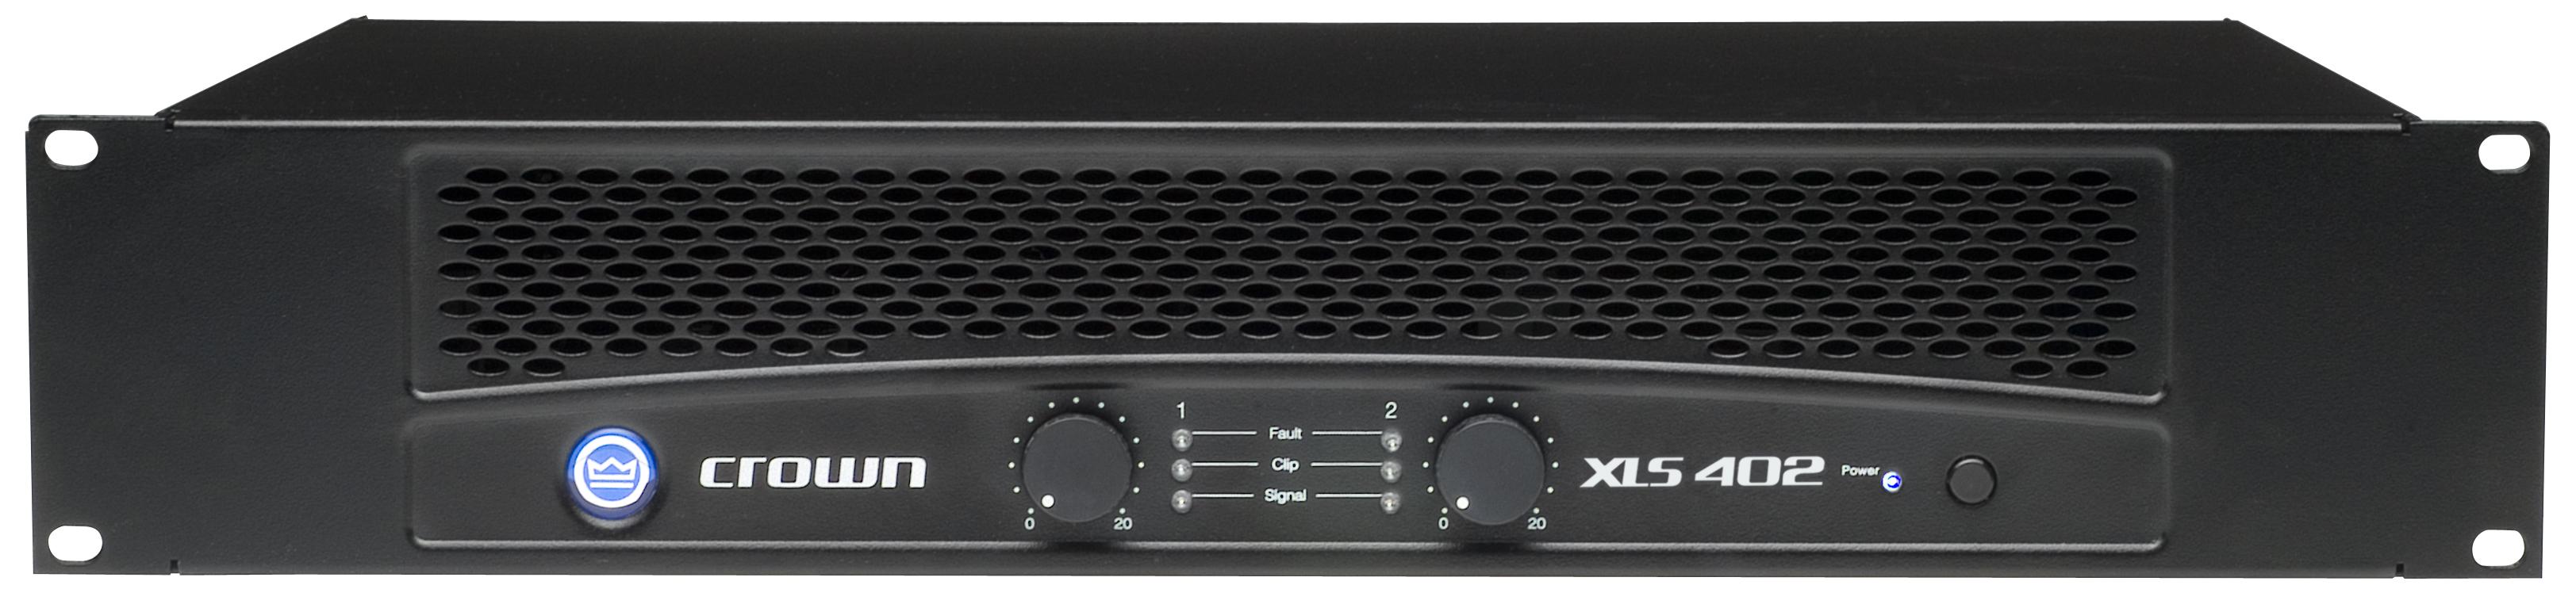 New 2018 Toyota Camry Xse V6 Fwd Xse V6 4dr Sedan 4t1bz1hk4ju503398 likewise Nurse Call in addition Rockarena 1977 likewise Jaybird further Xtreme Portable Bluetooth Speaker Black 7316JXB. on jbl audio careers